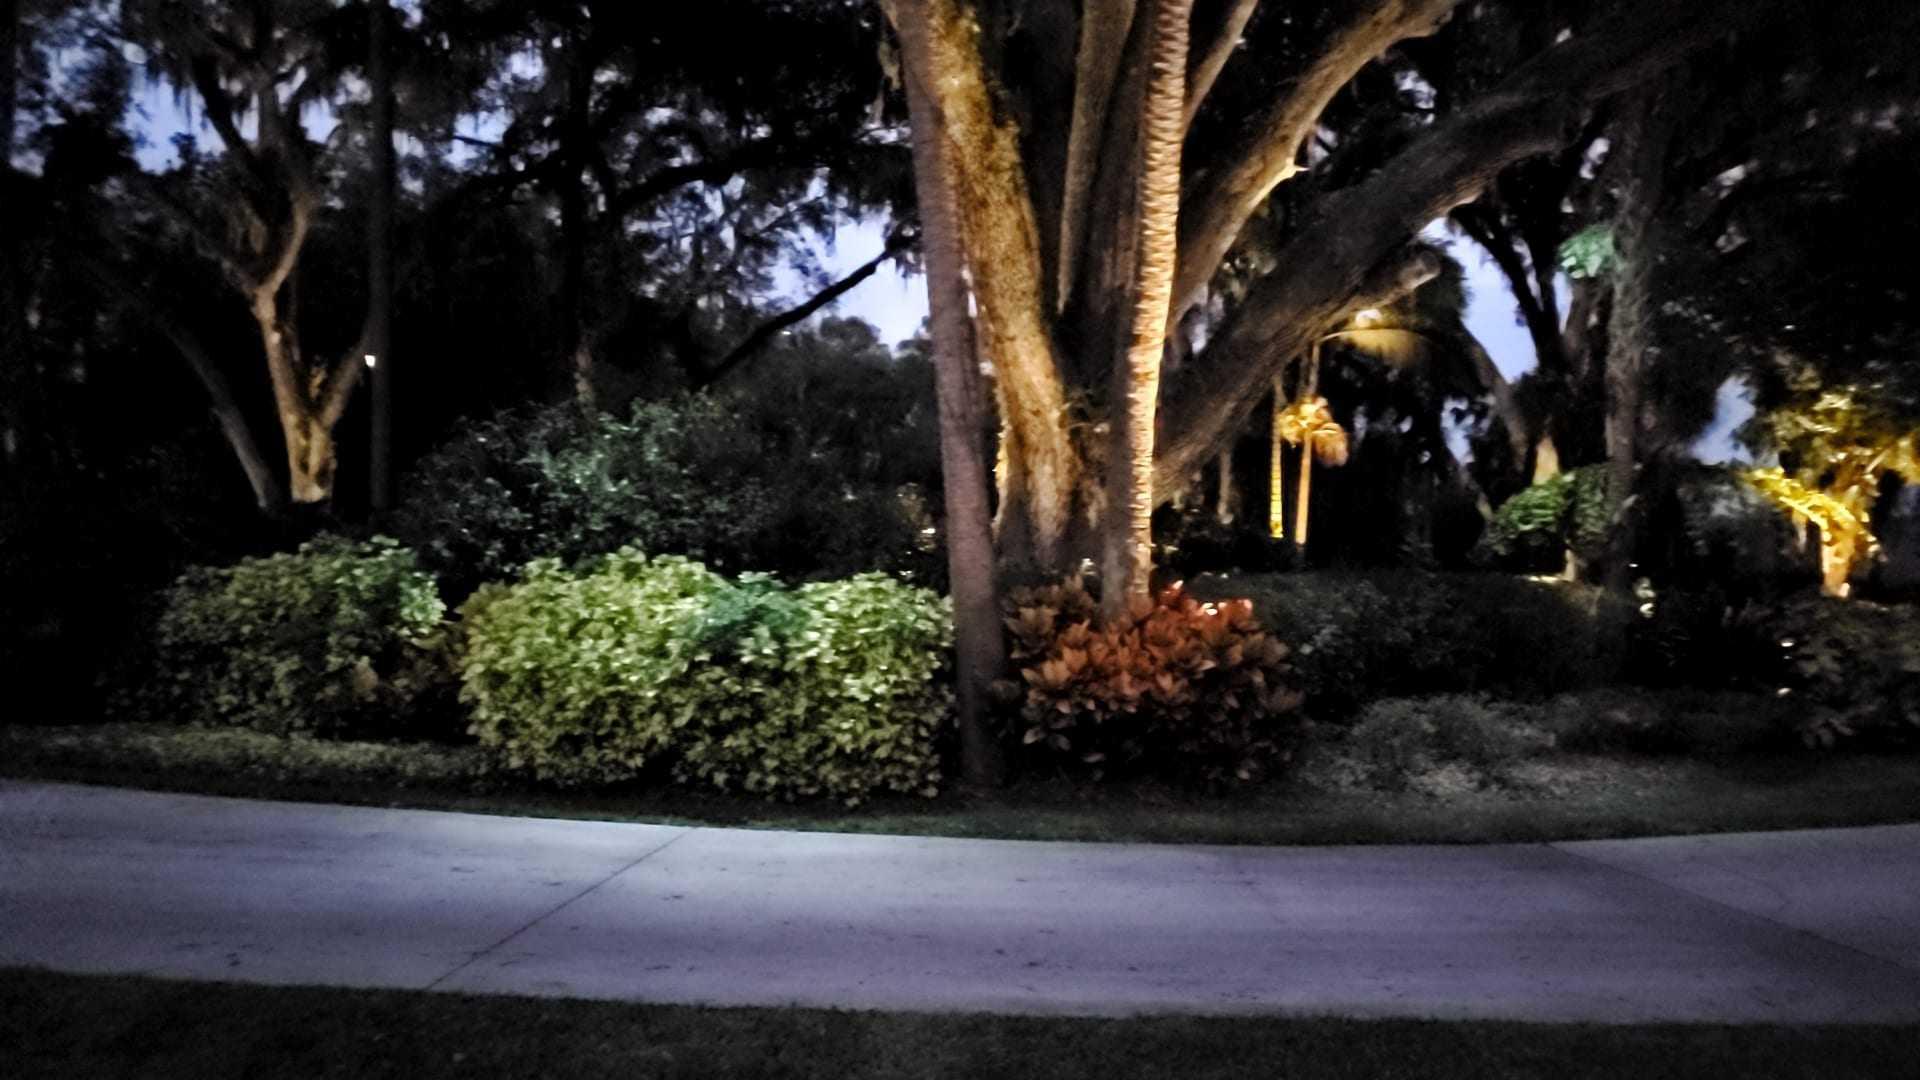 outdoor lighting repair tampa beyond